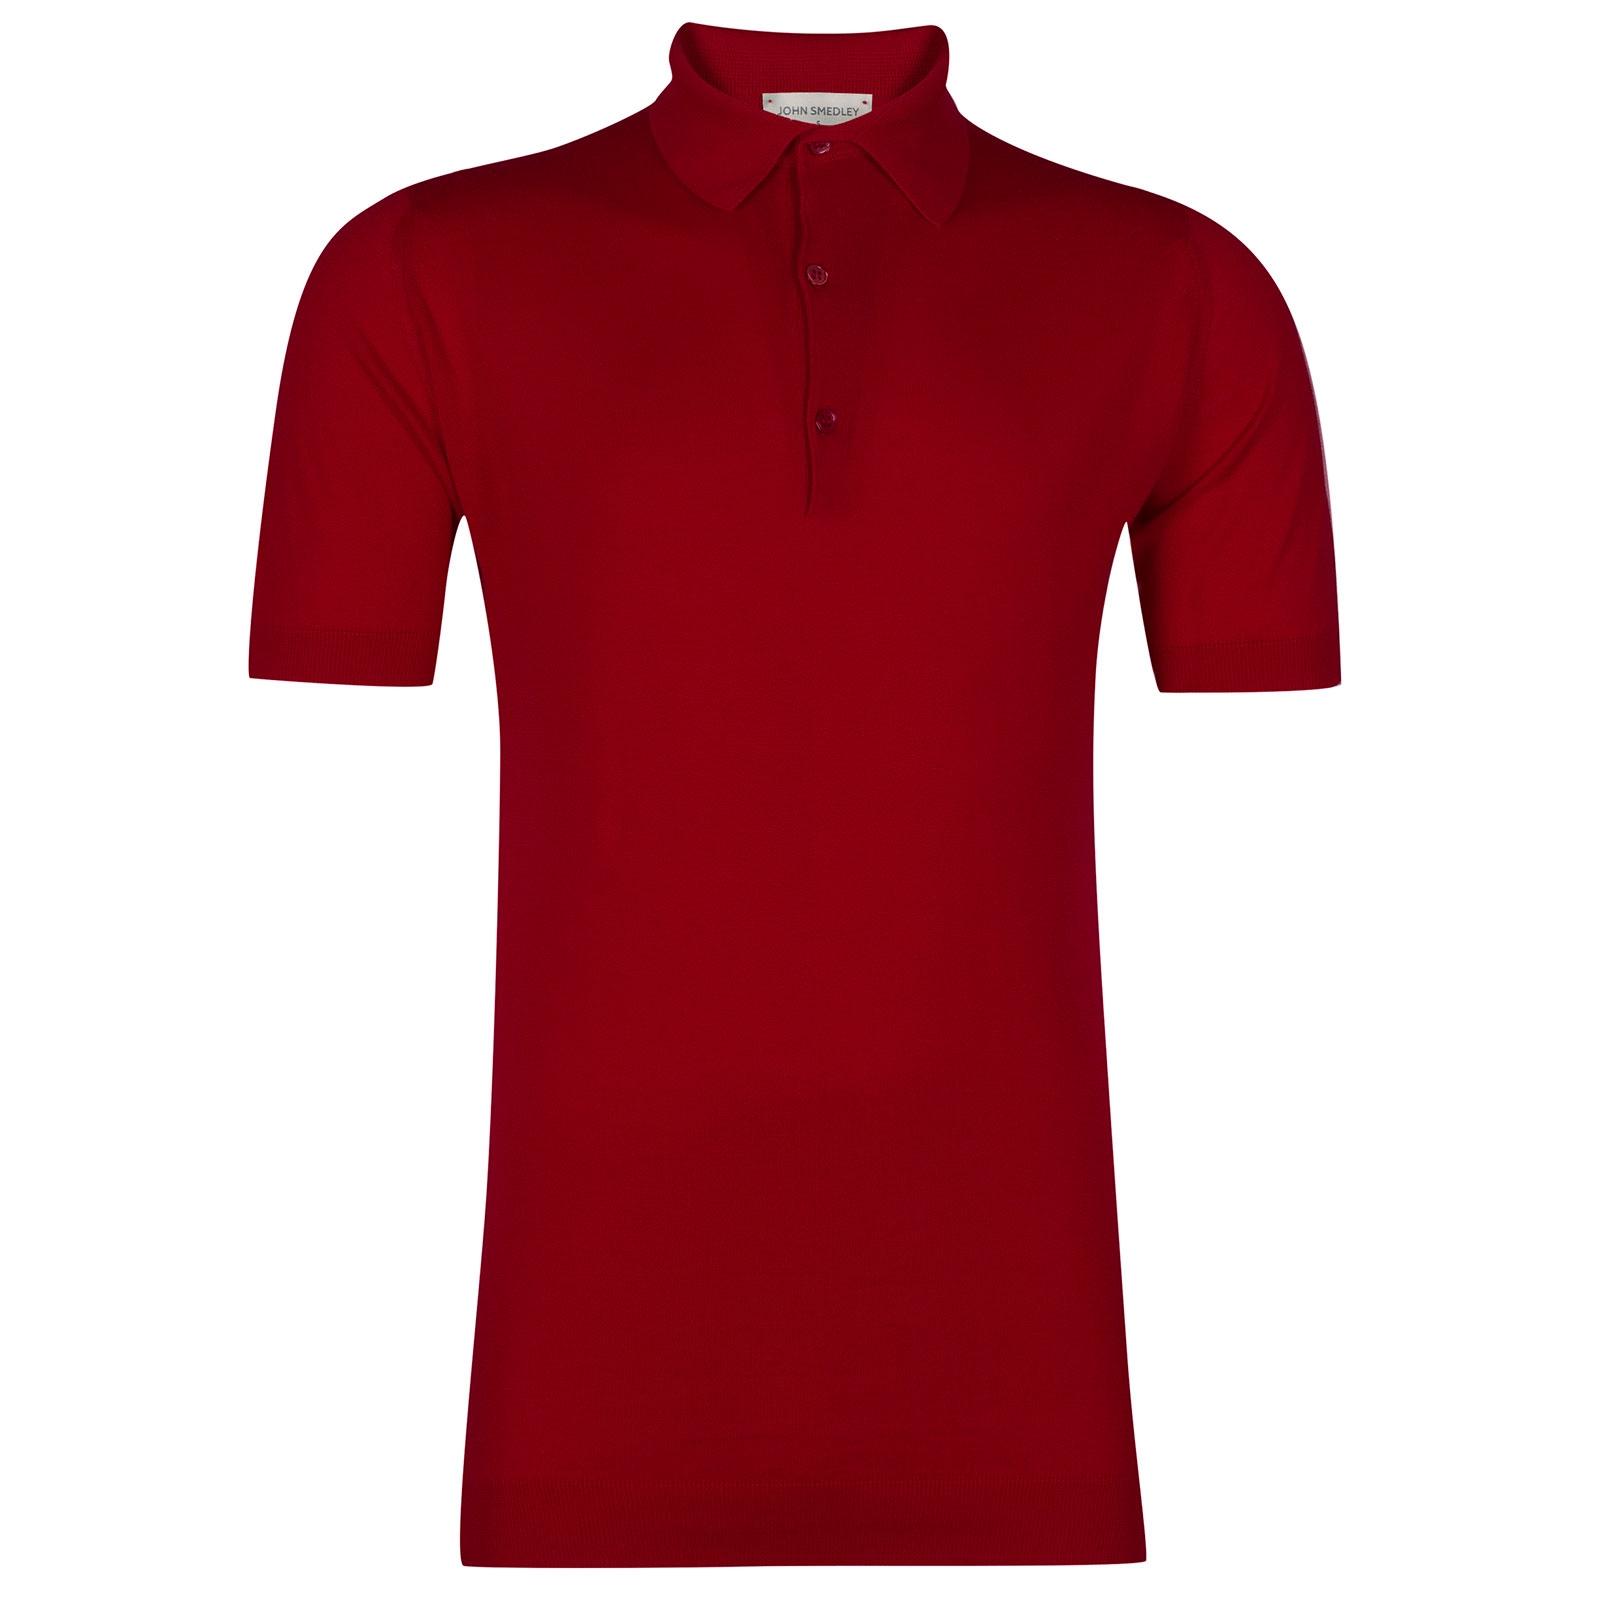 John Smedley Adrian Sea Island Cotton Shirt in Dandy Red-L